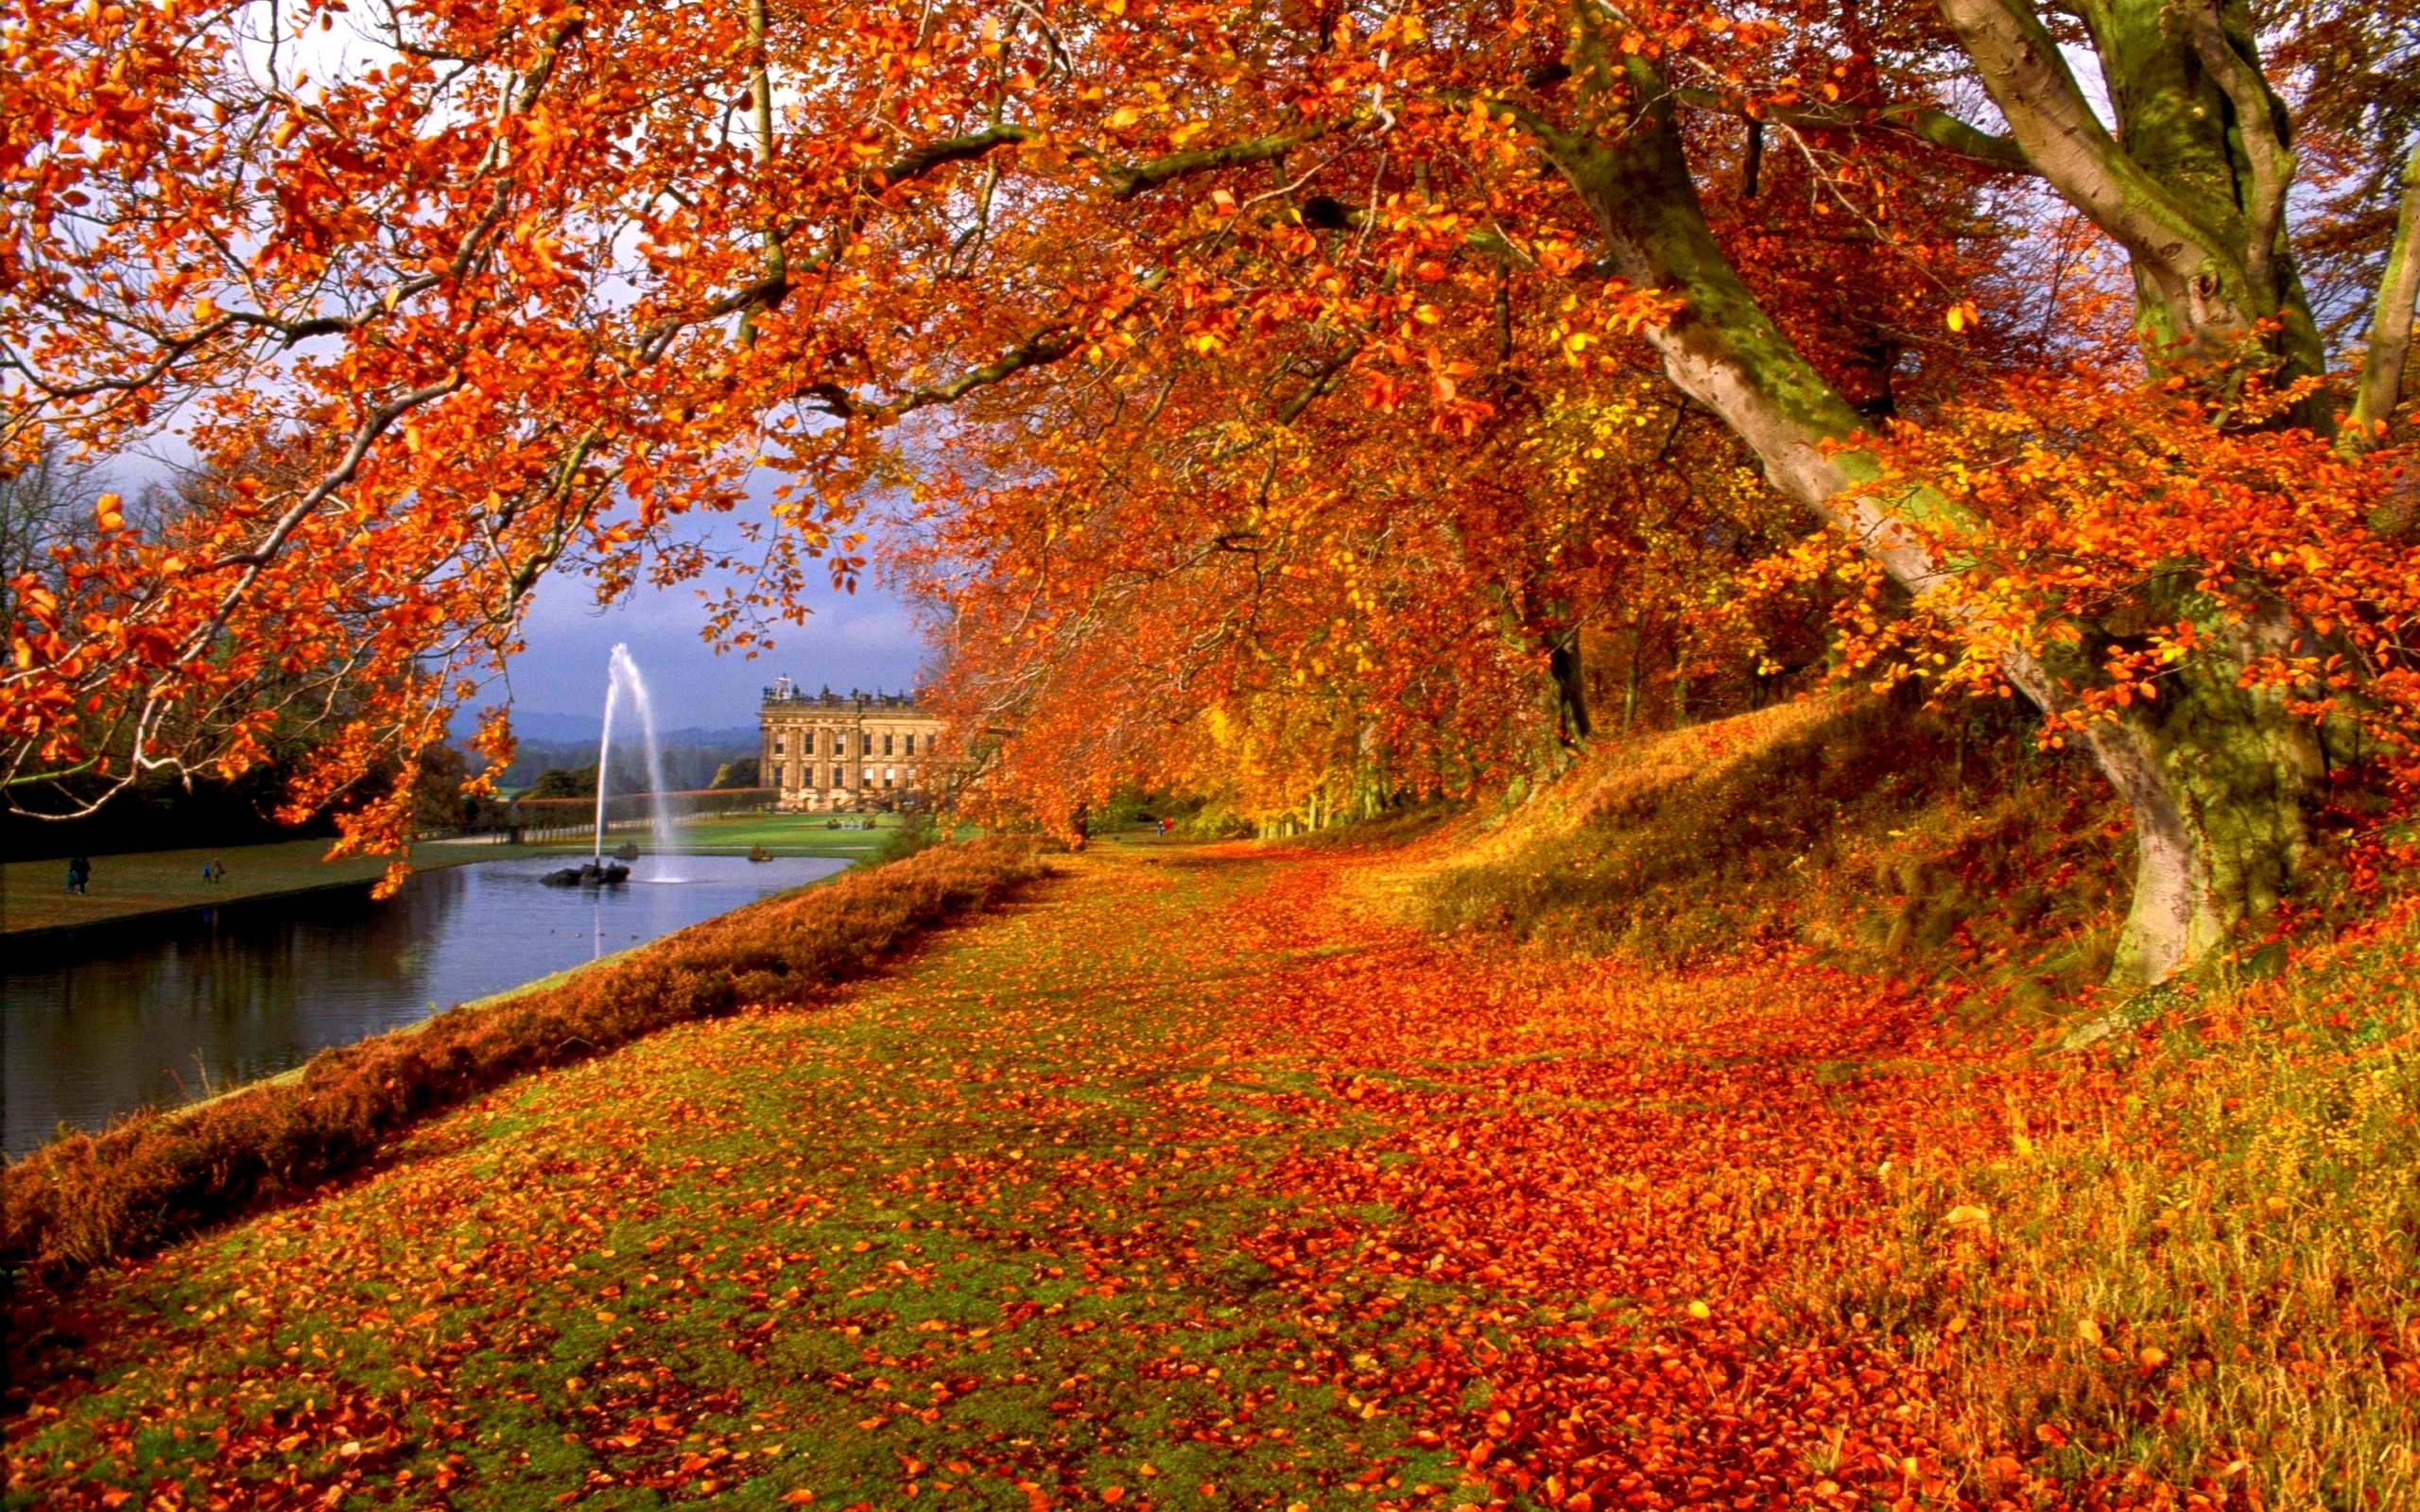 Autumn Backgrounds Image 2560x1600